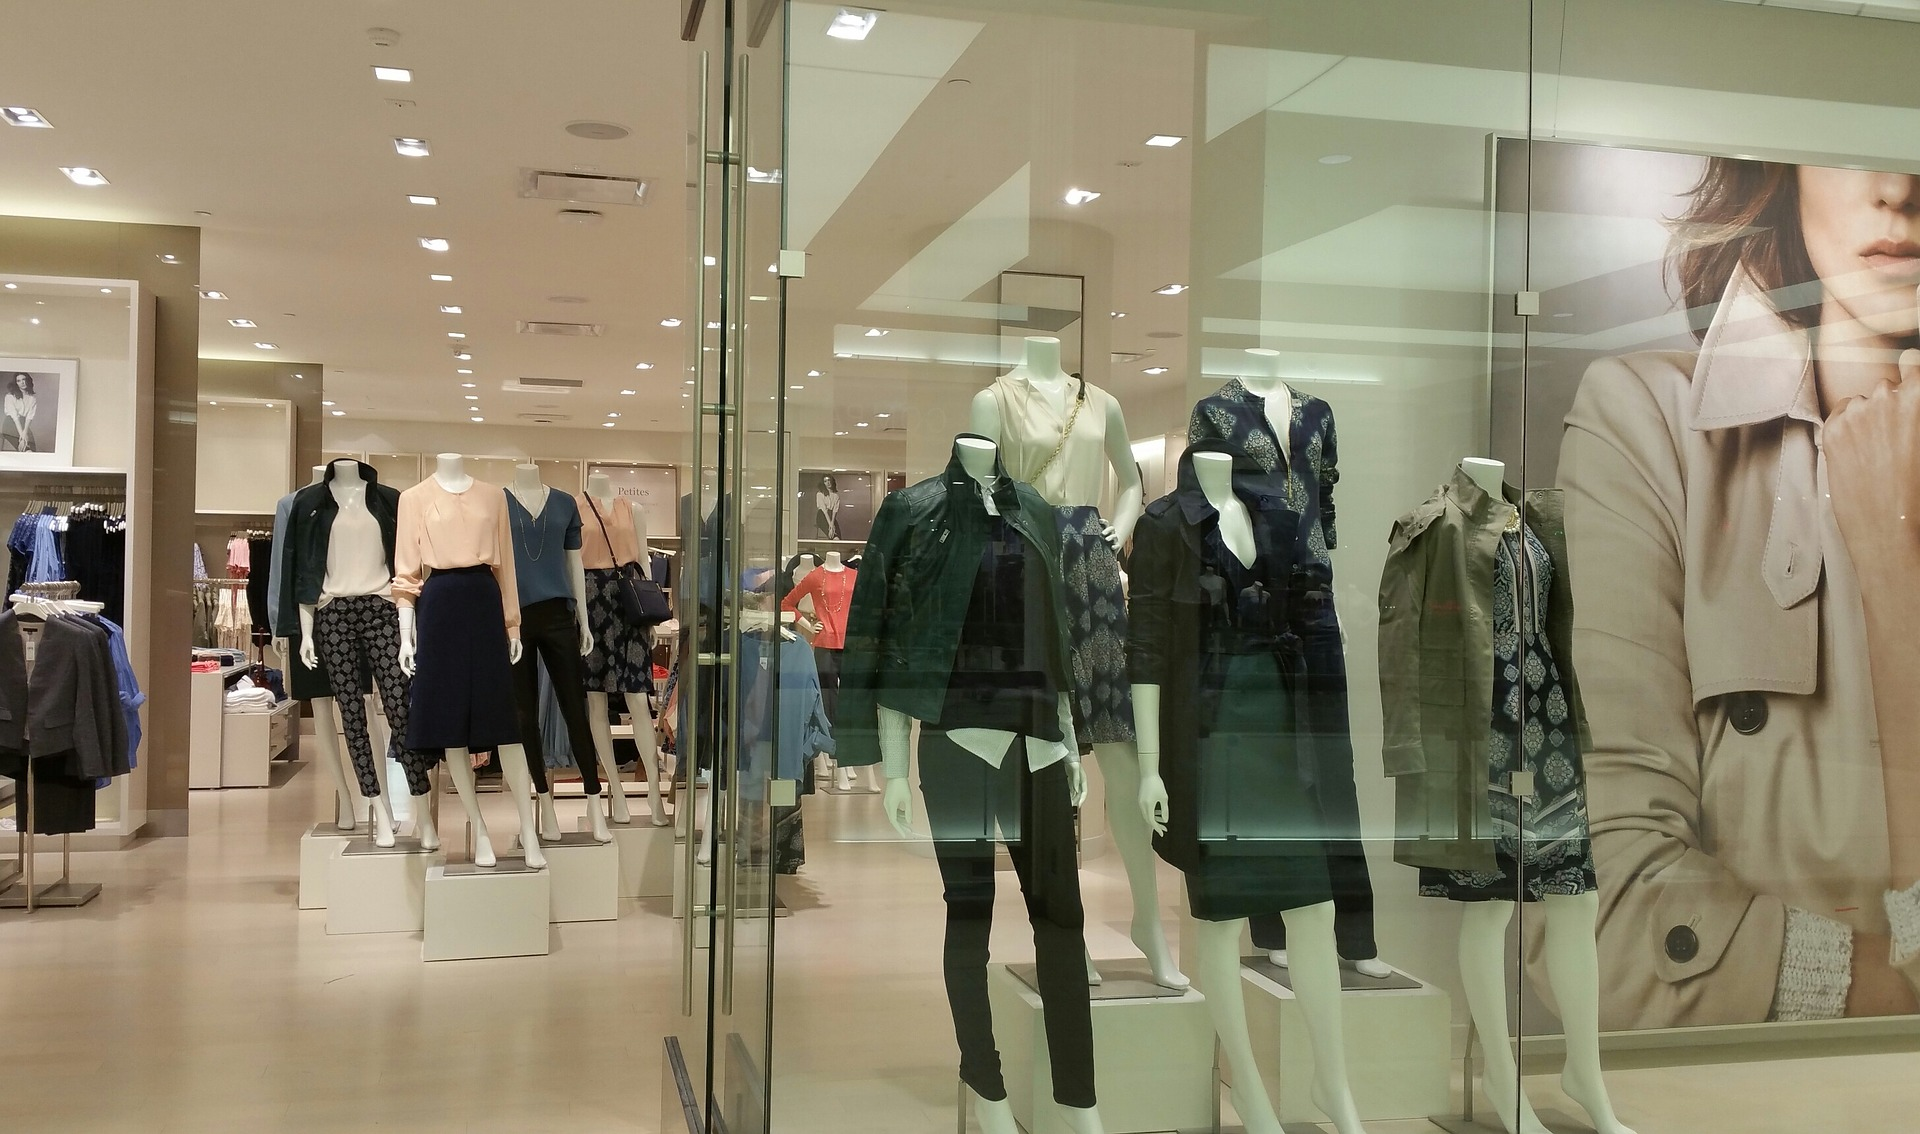 Weekly economic news roundup and standardized dress sizes